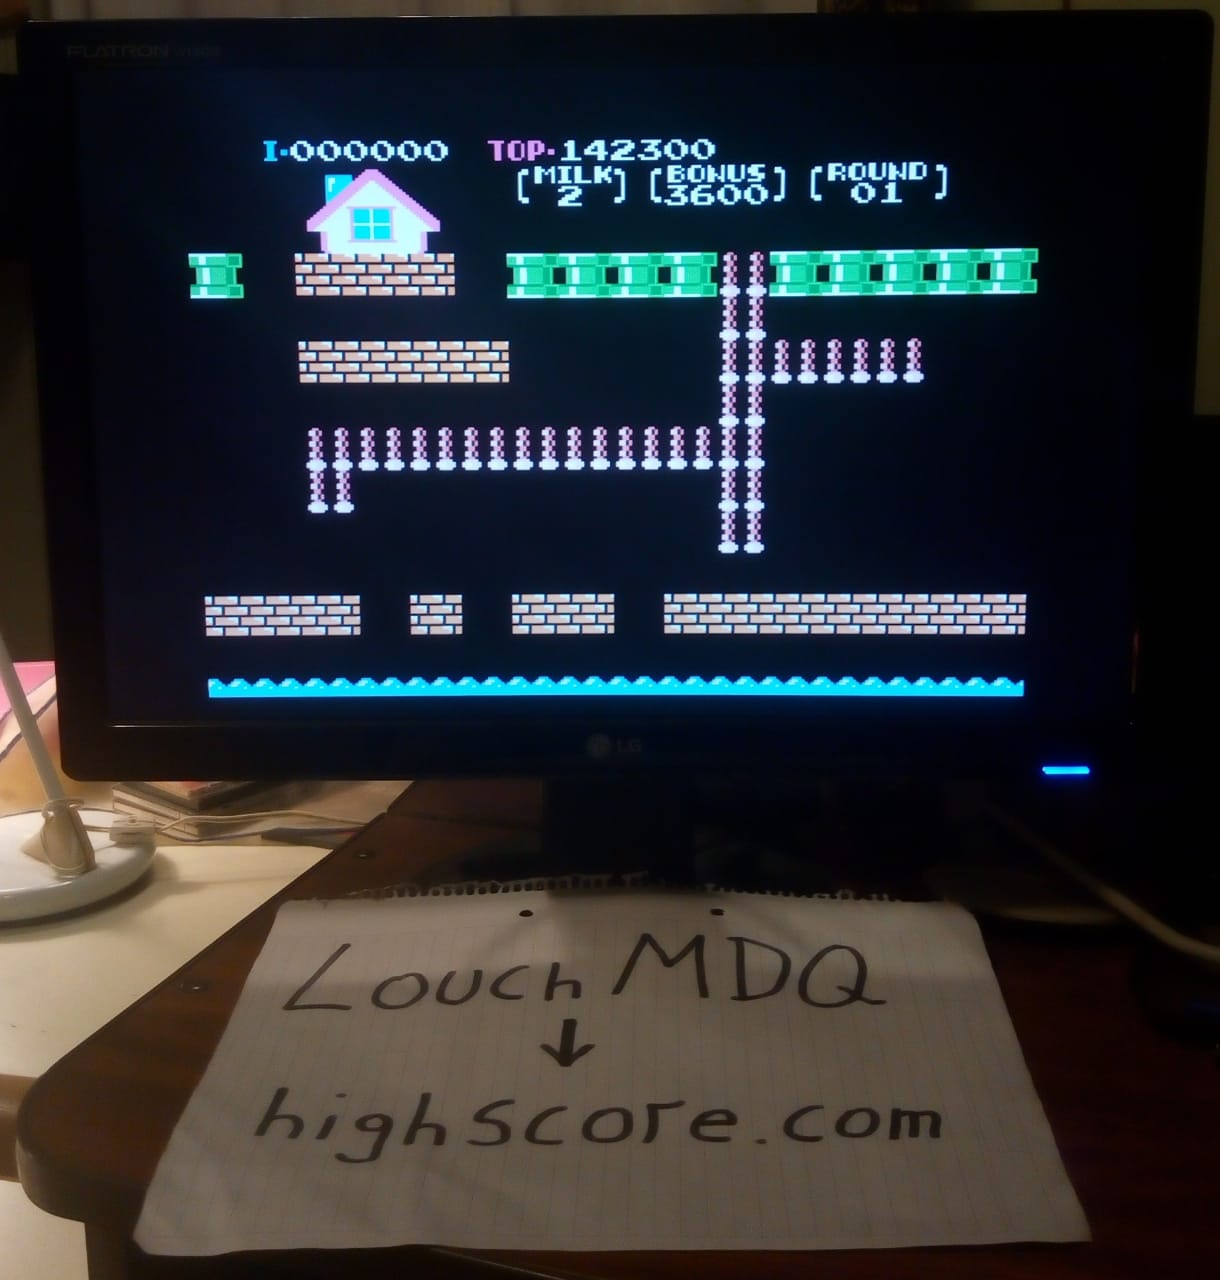 LouchMDQ: Nuts & Milk (NES/Famicom Emulated) 142,300 points on 2020-06-28 04:16:10